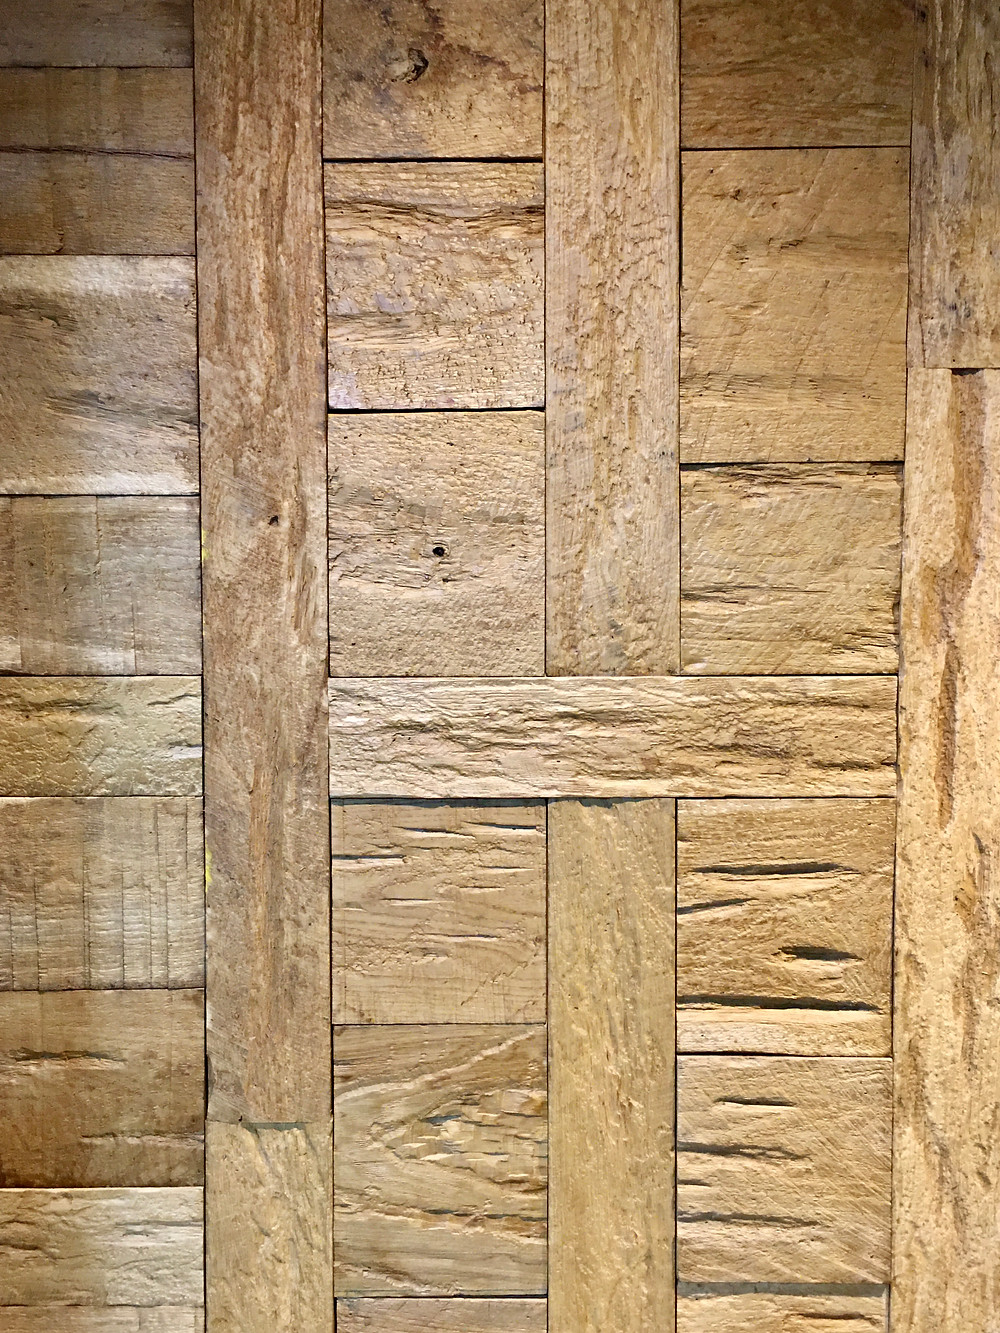 Rustic Wood Cladding Wall